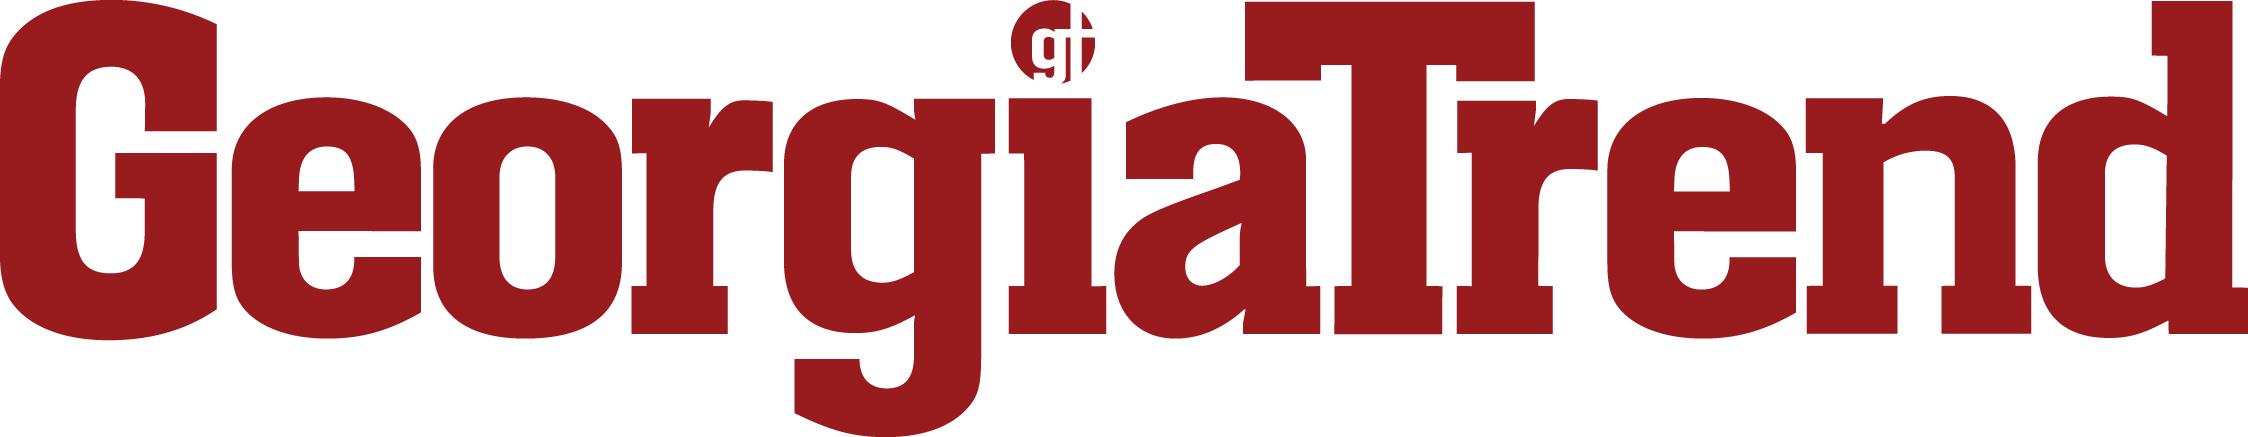 Georgia Trend logo